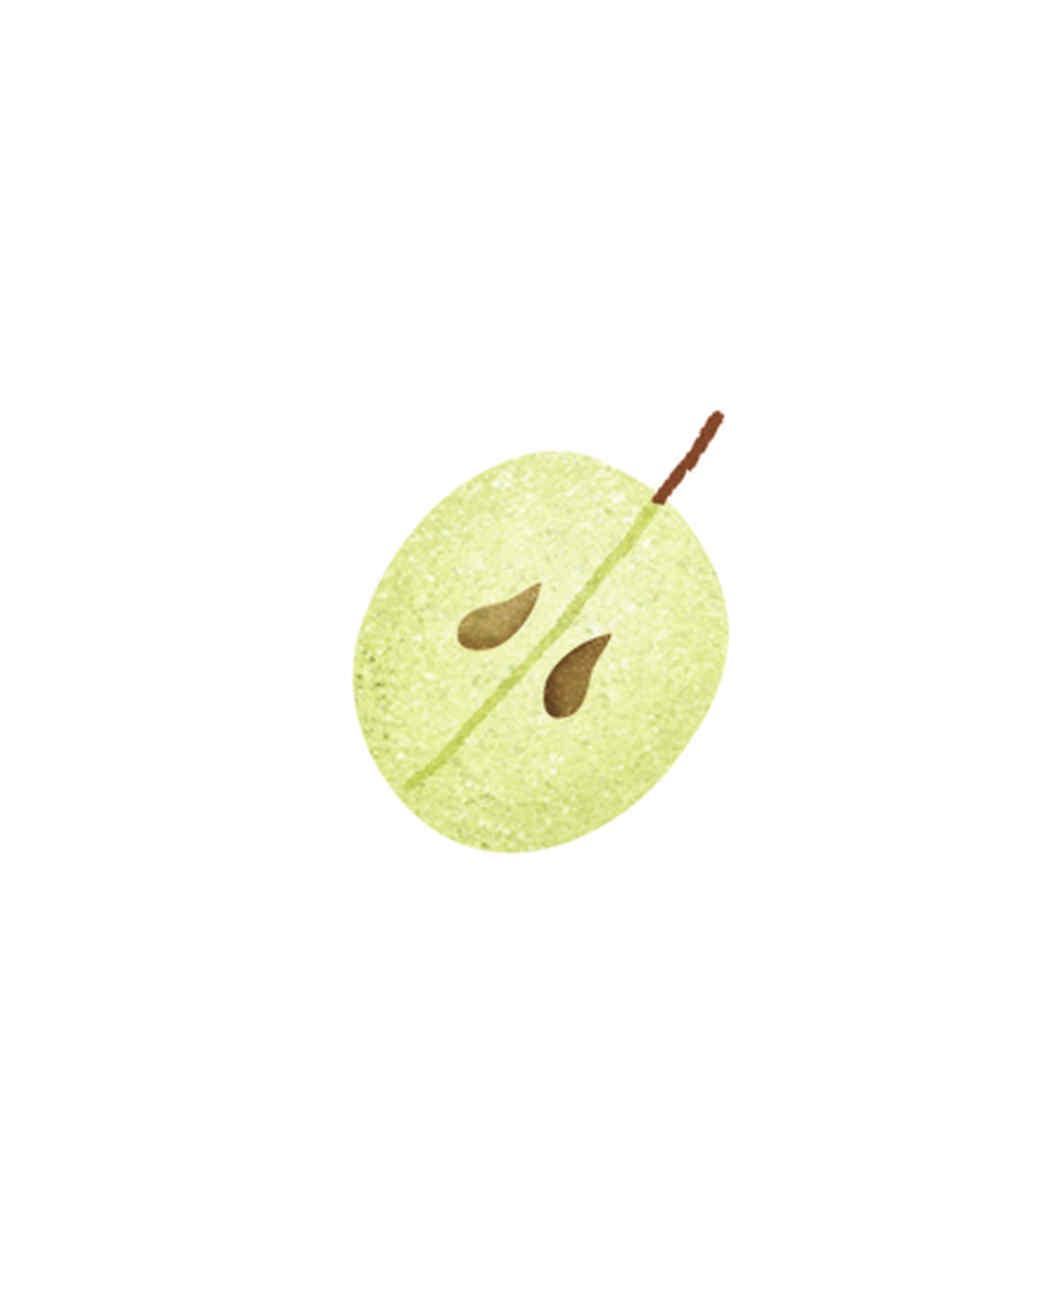 essential-oils-illustration-03.jpg